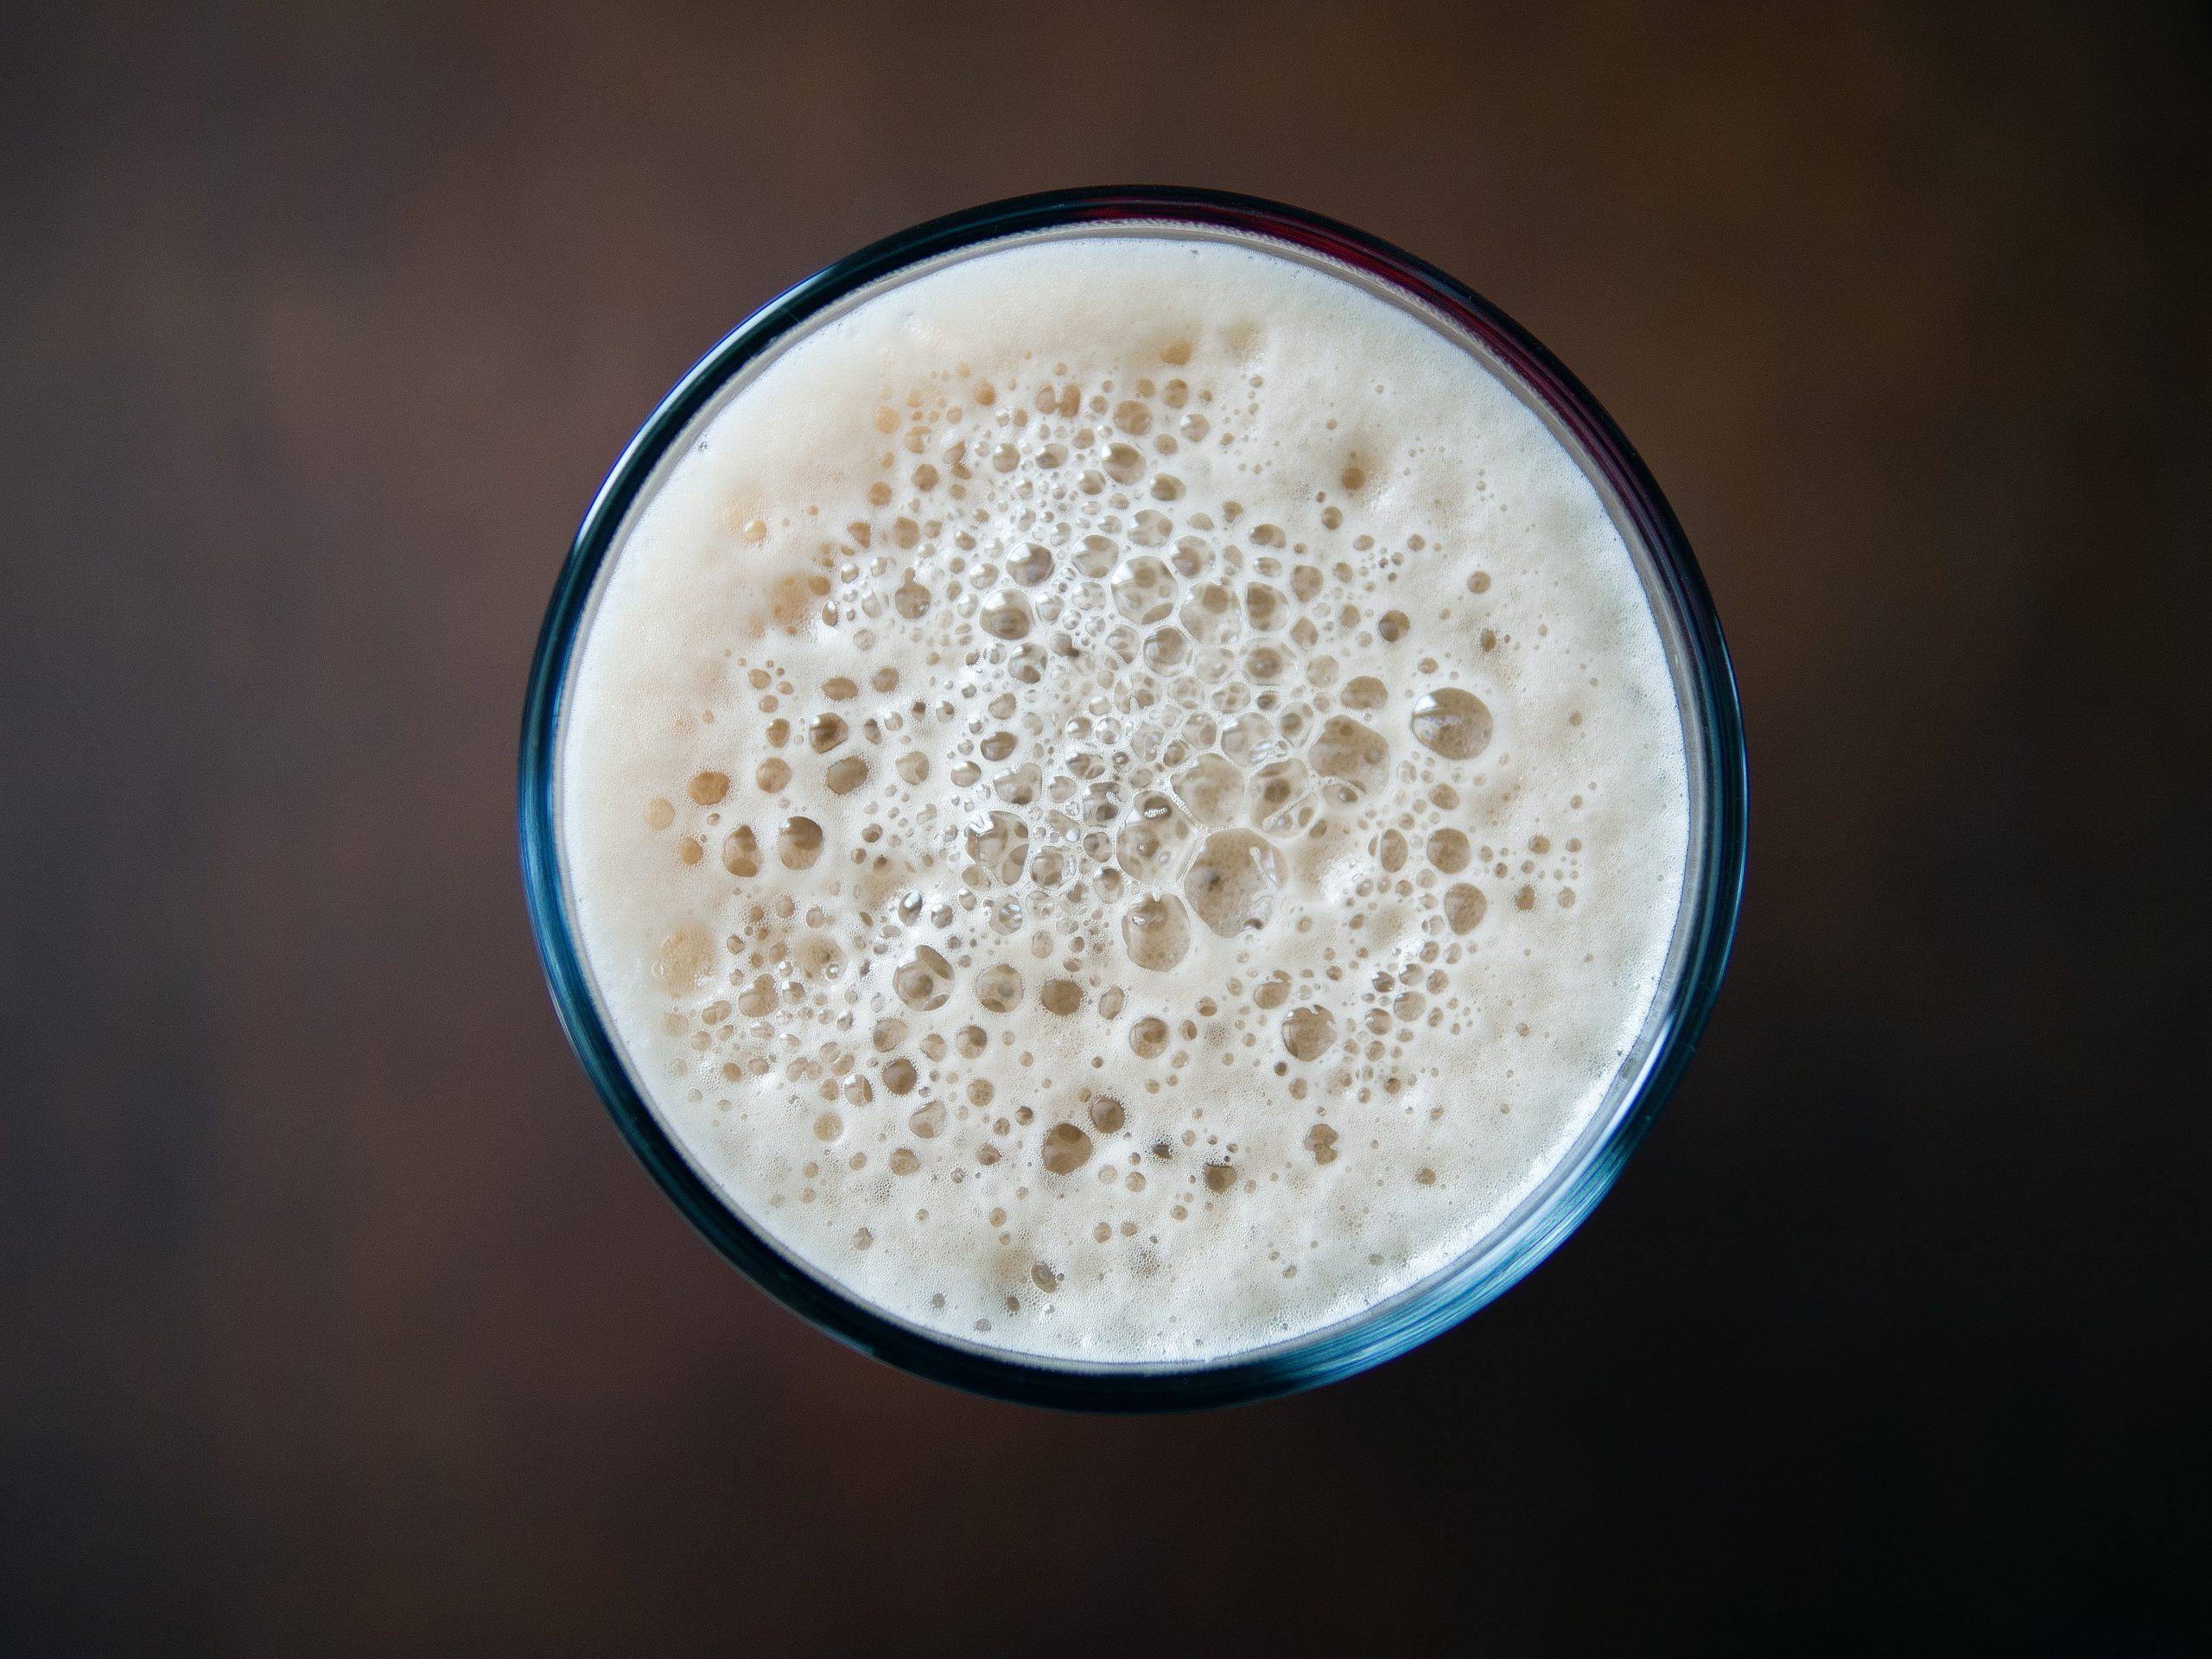 milk on glass